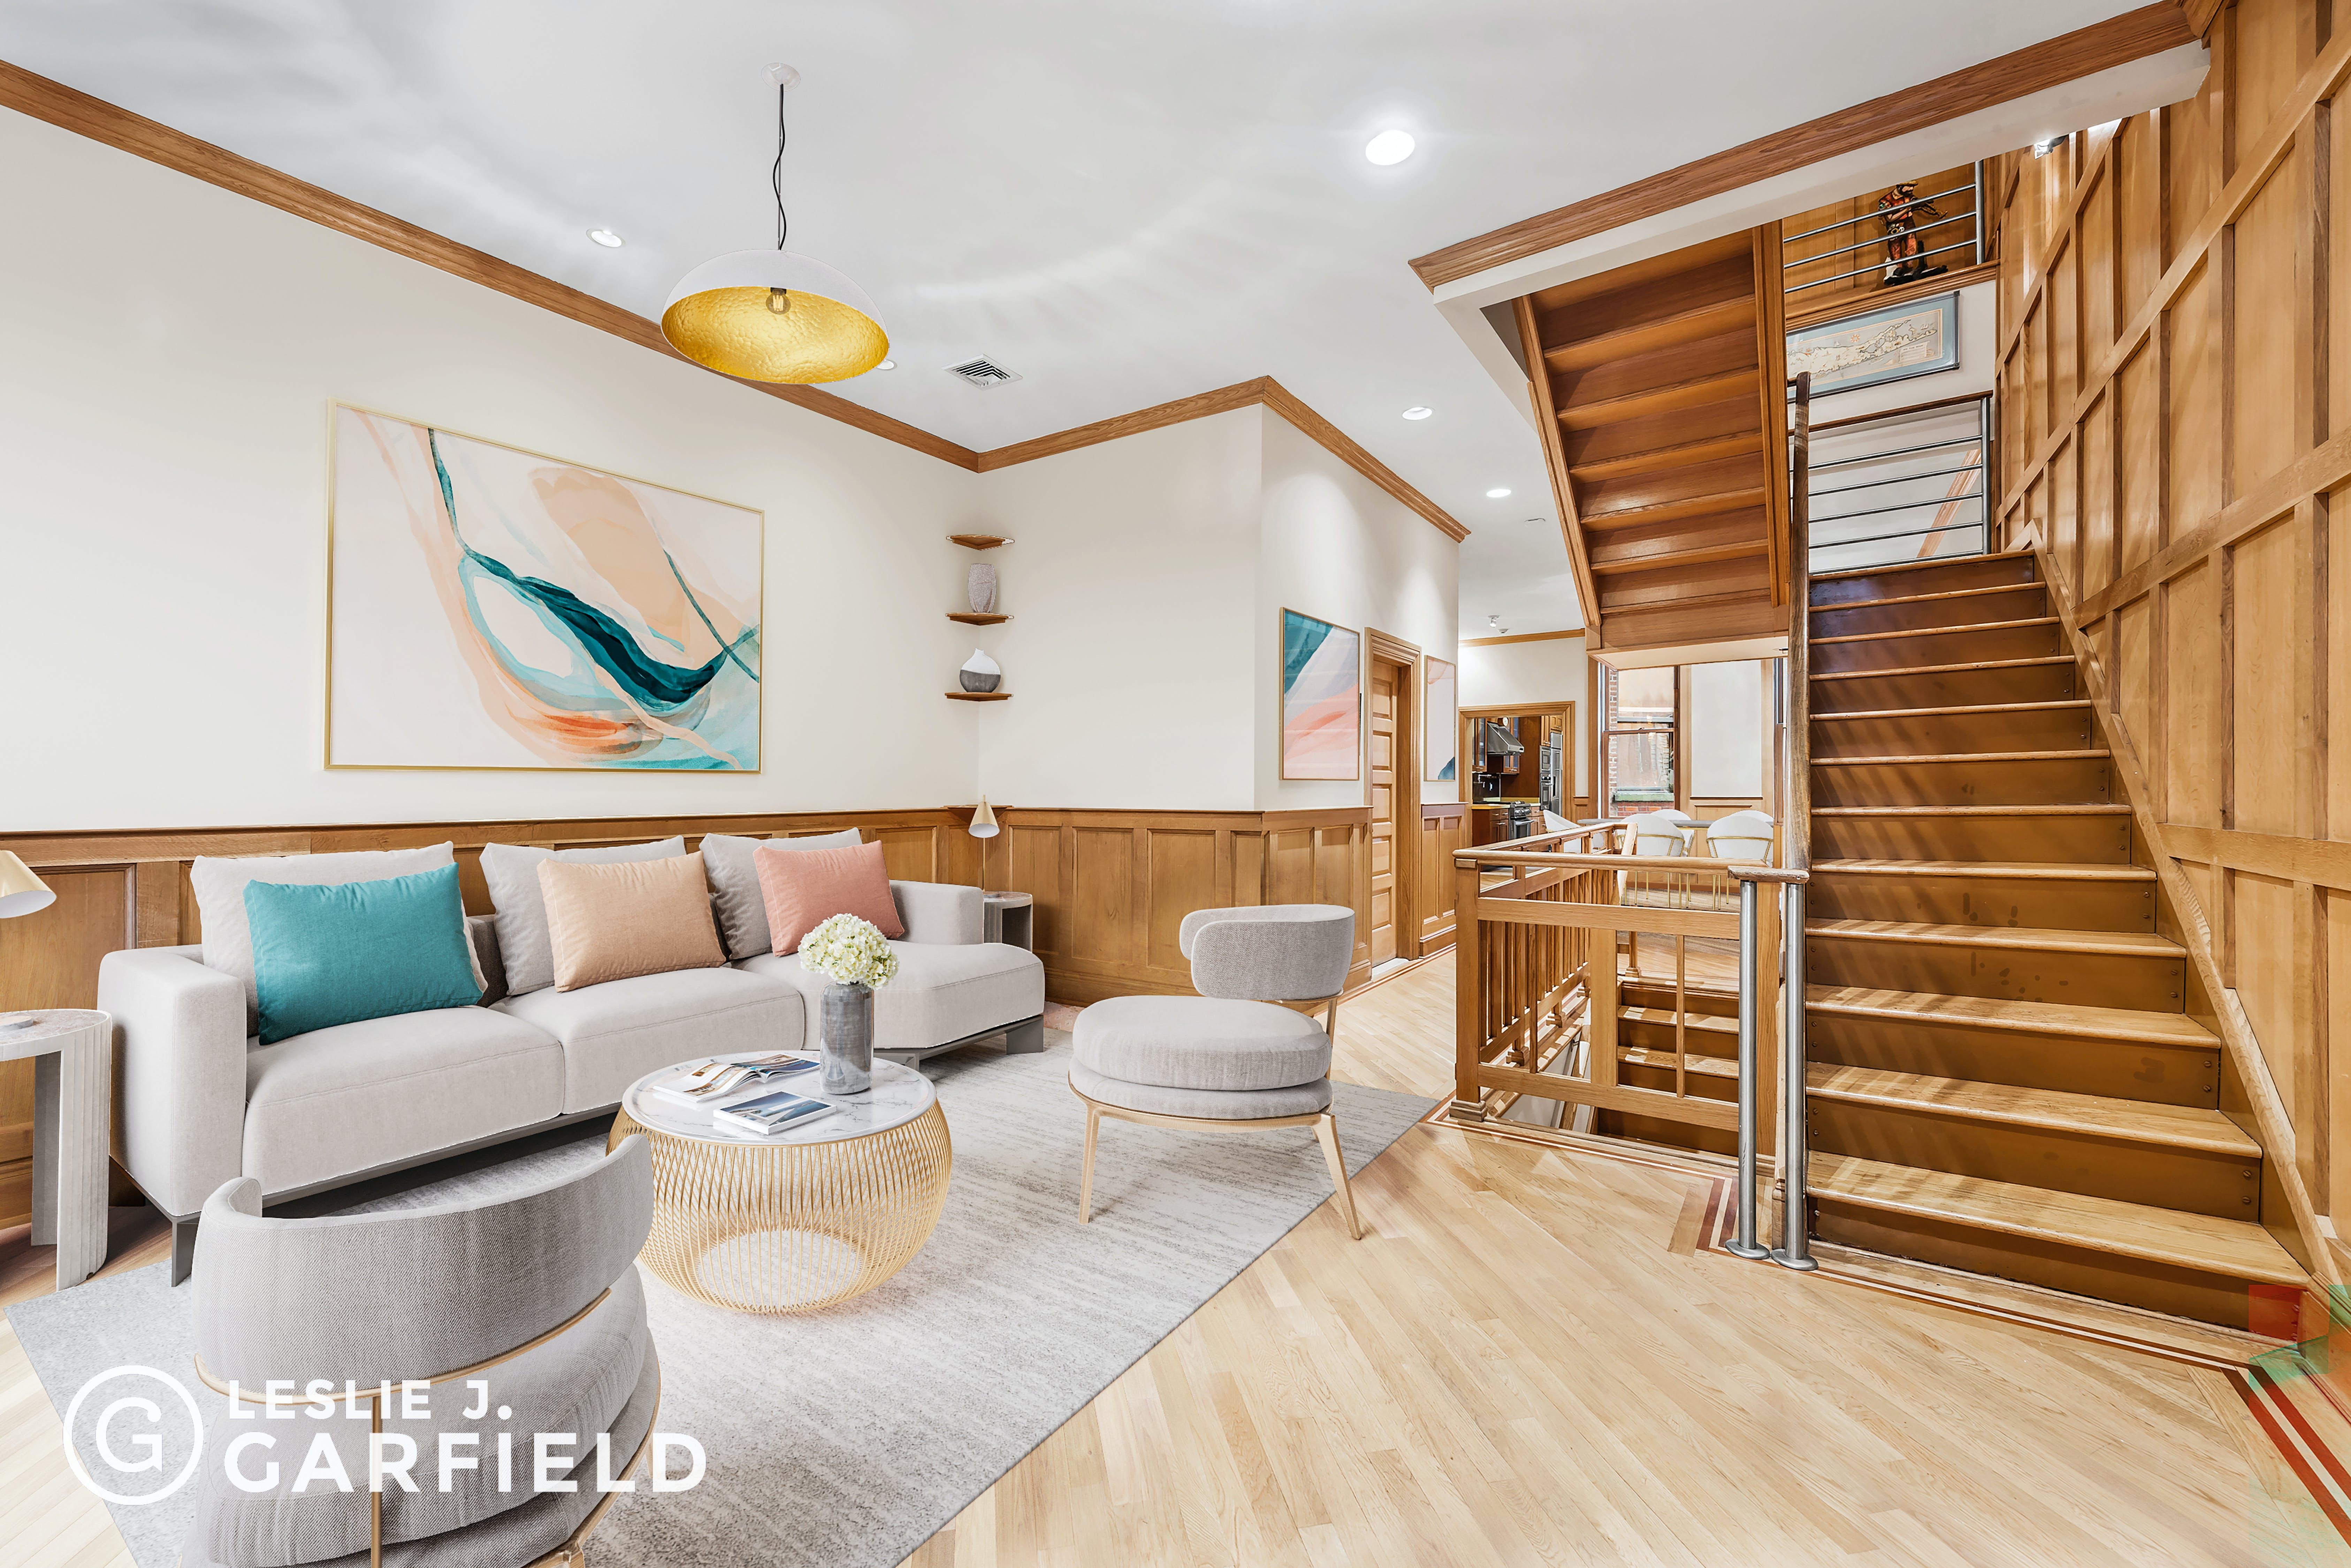 2 West 123rd Street - 1dae02eb-dd72-426b-826d-0ece75c02207 - New York City Townhouse Real Estate